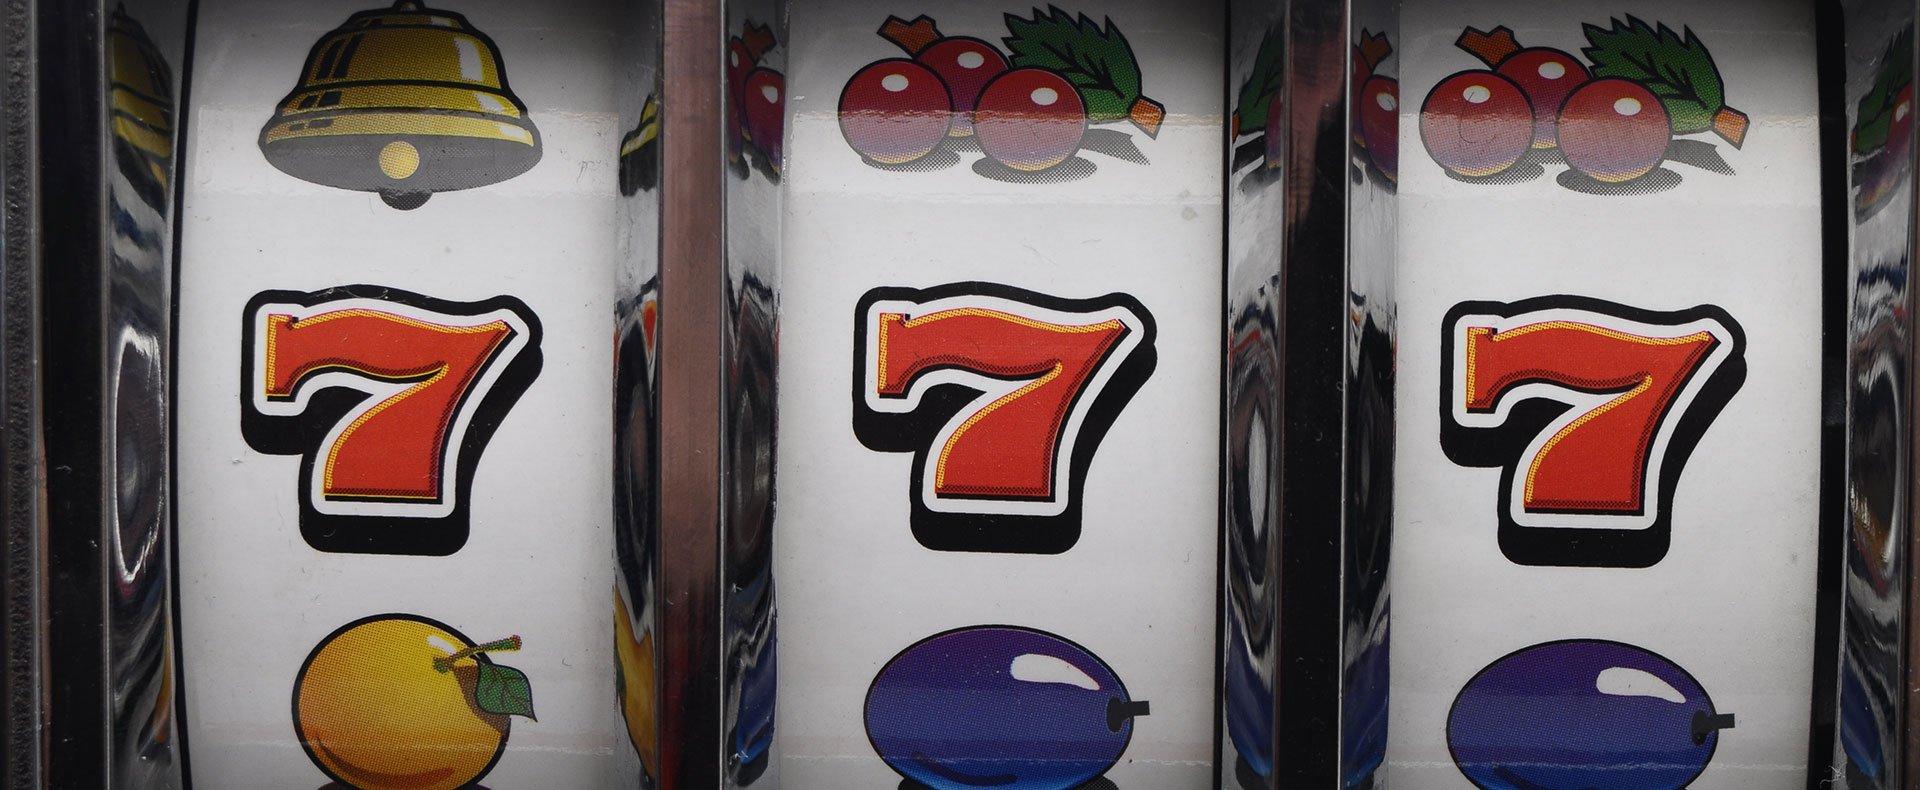 schermata di slot machine